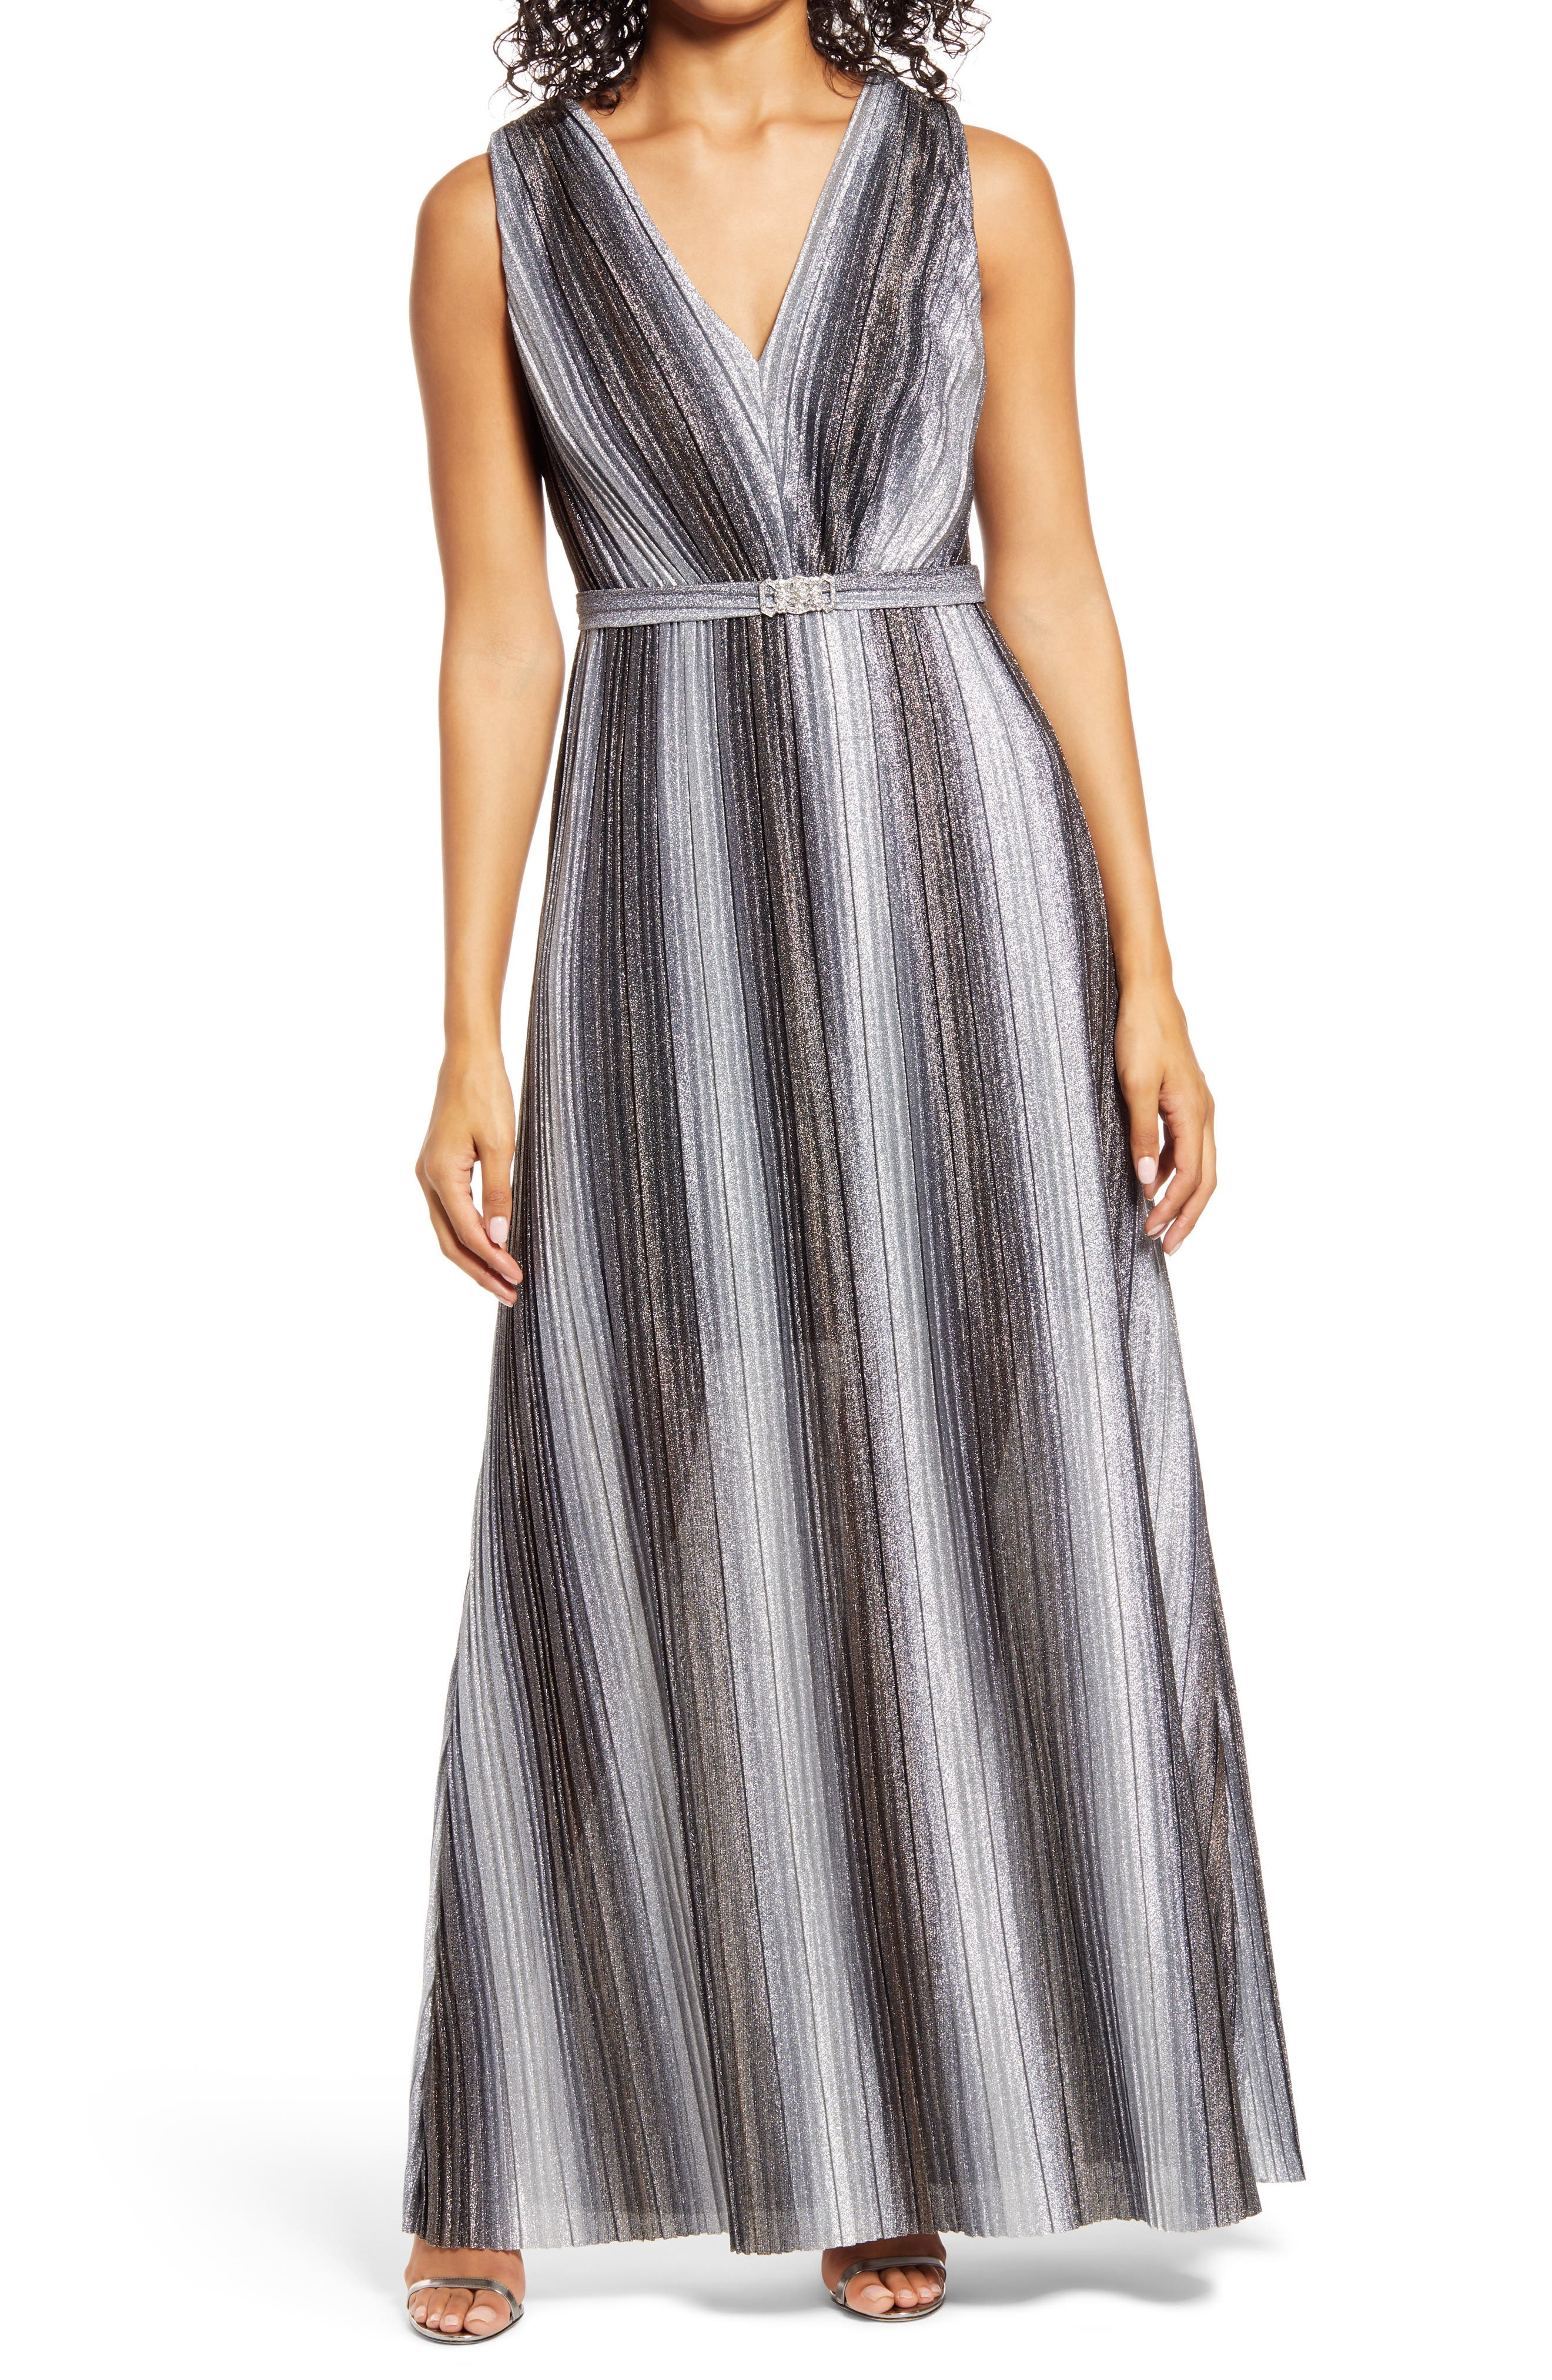 70s Prom, Formal, Evening, Party Dresses Vince Camuto Metallic Stripe Sleeveless V-Neck Gown Size 14 - Gunmetal at Nordstrom Rack $116.97 AT vintagedancer.com